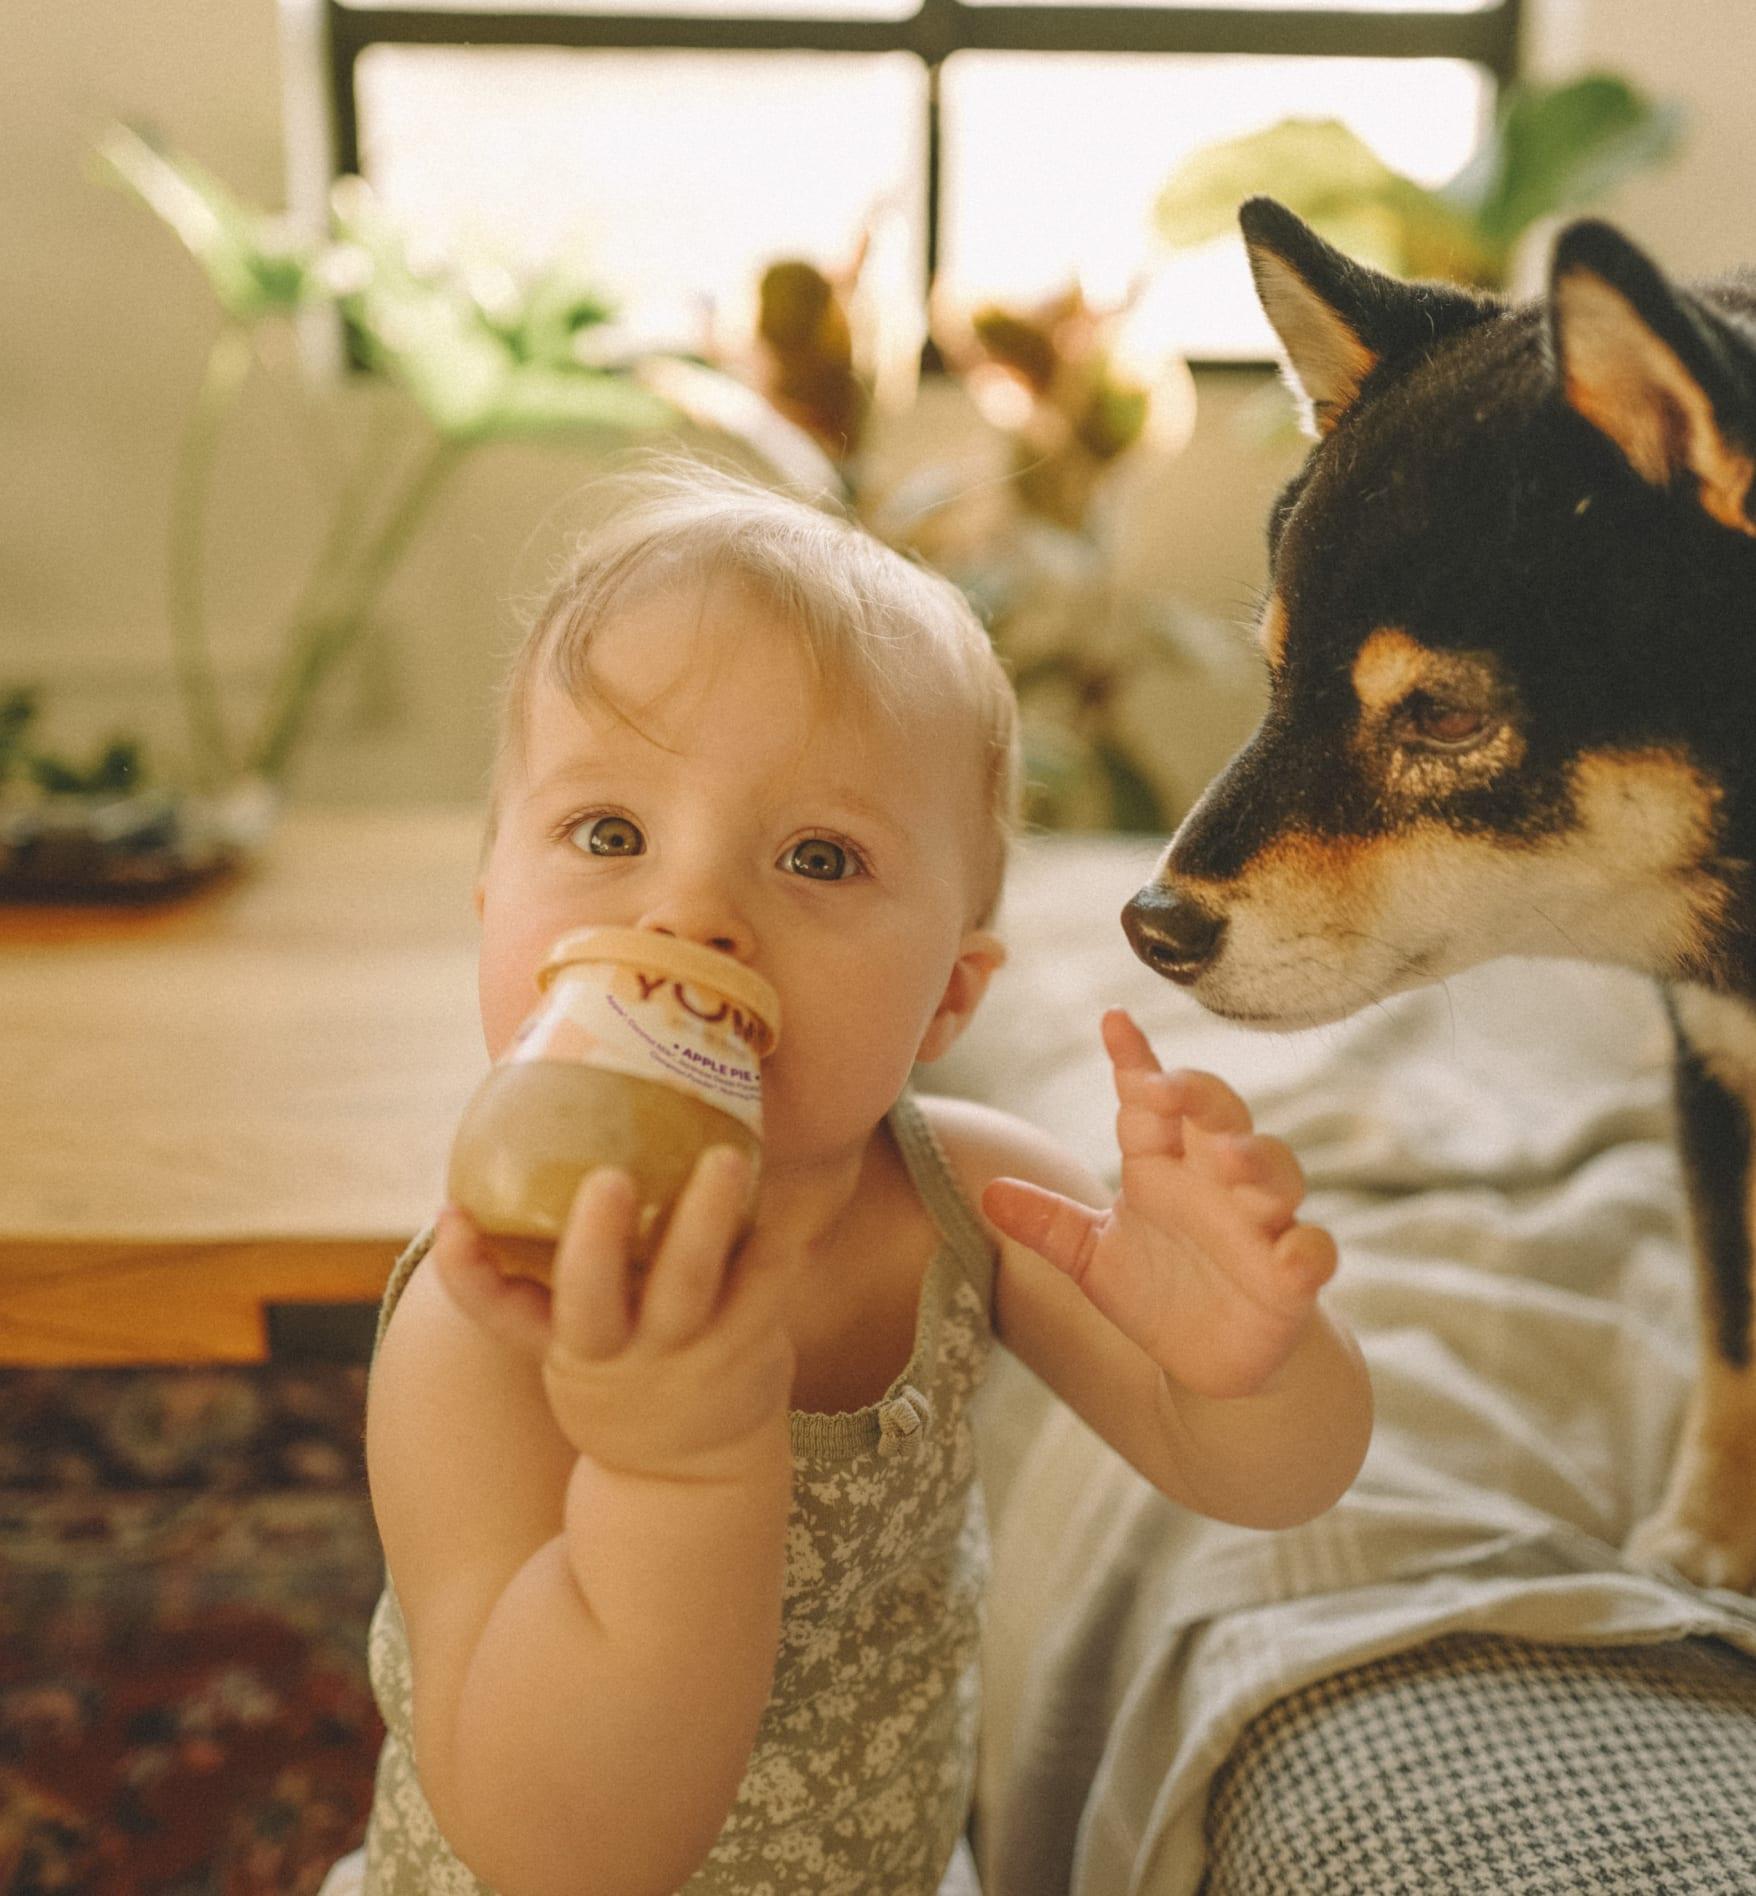 baby holding yumi jar with dog looking at baby and jar